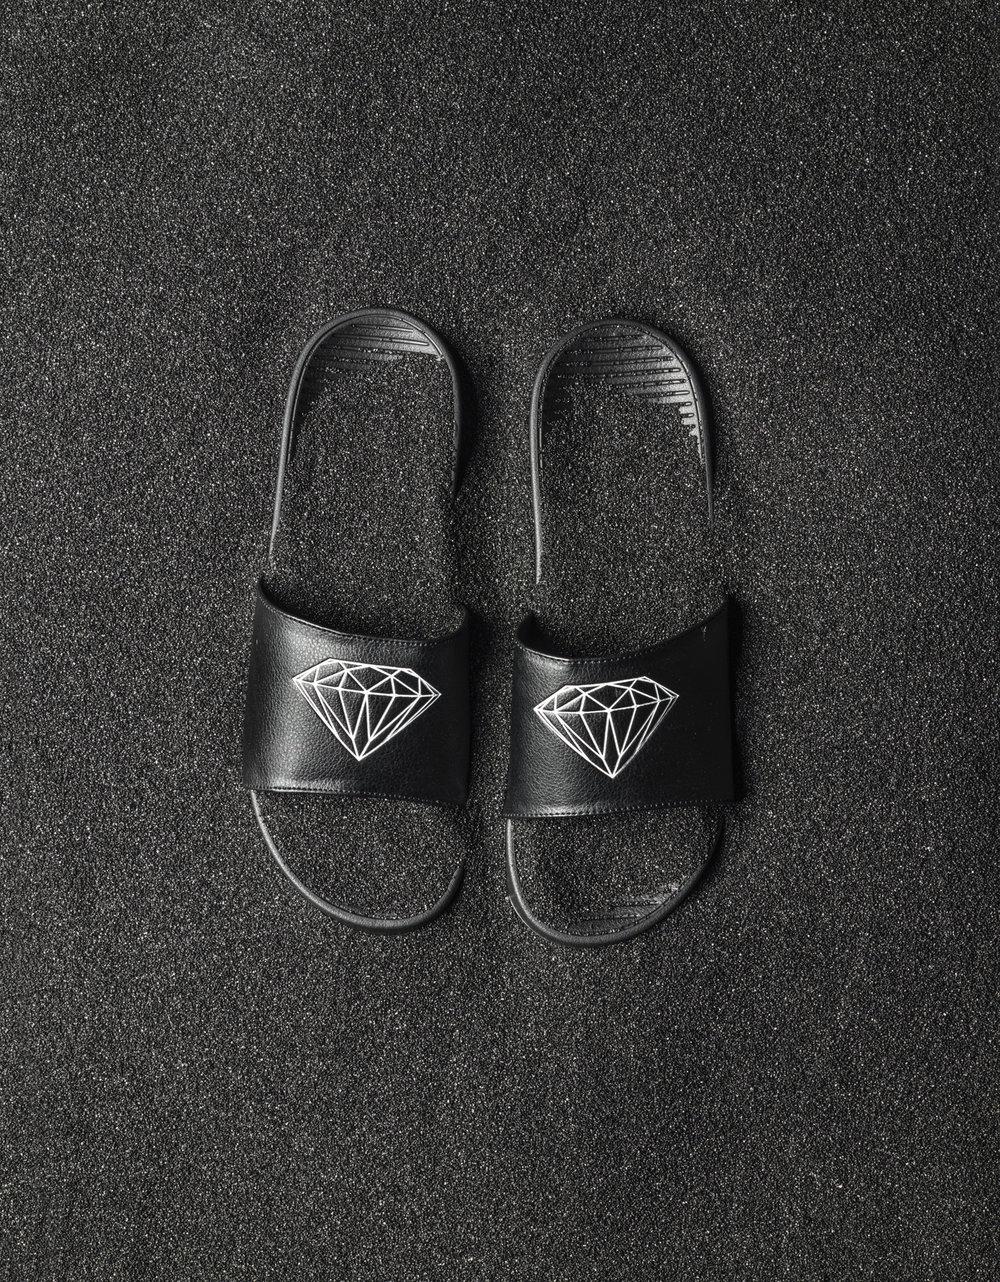 aimerito photography_product_footwear_diamond_2.jpg